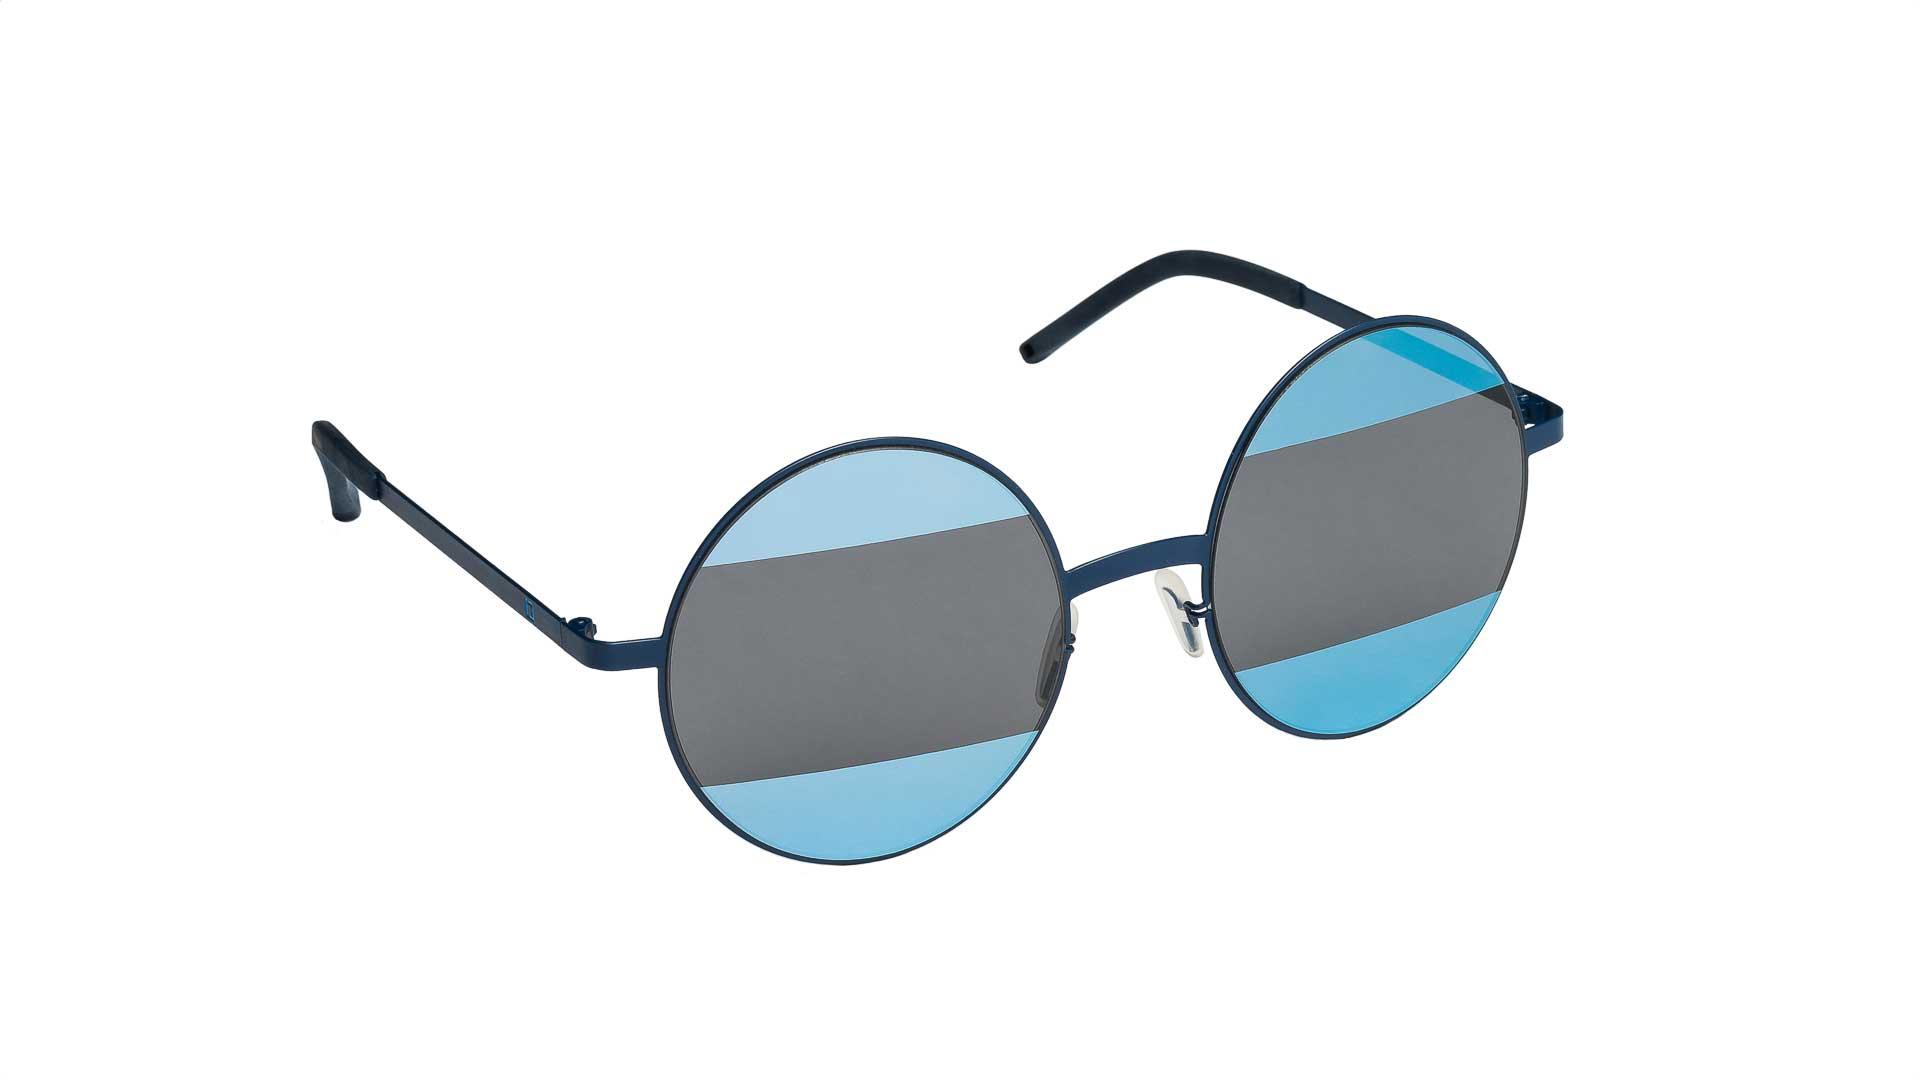 Occhiali da sole Mediterraneo colore blu